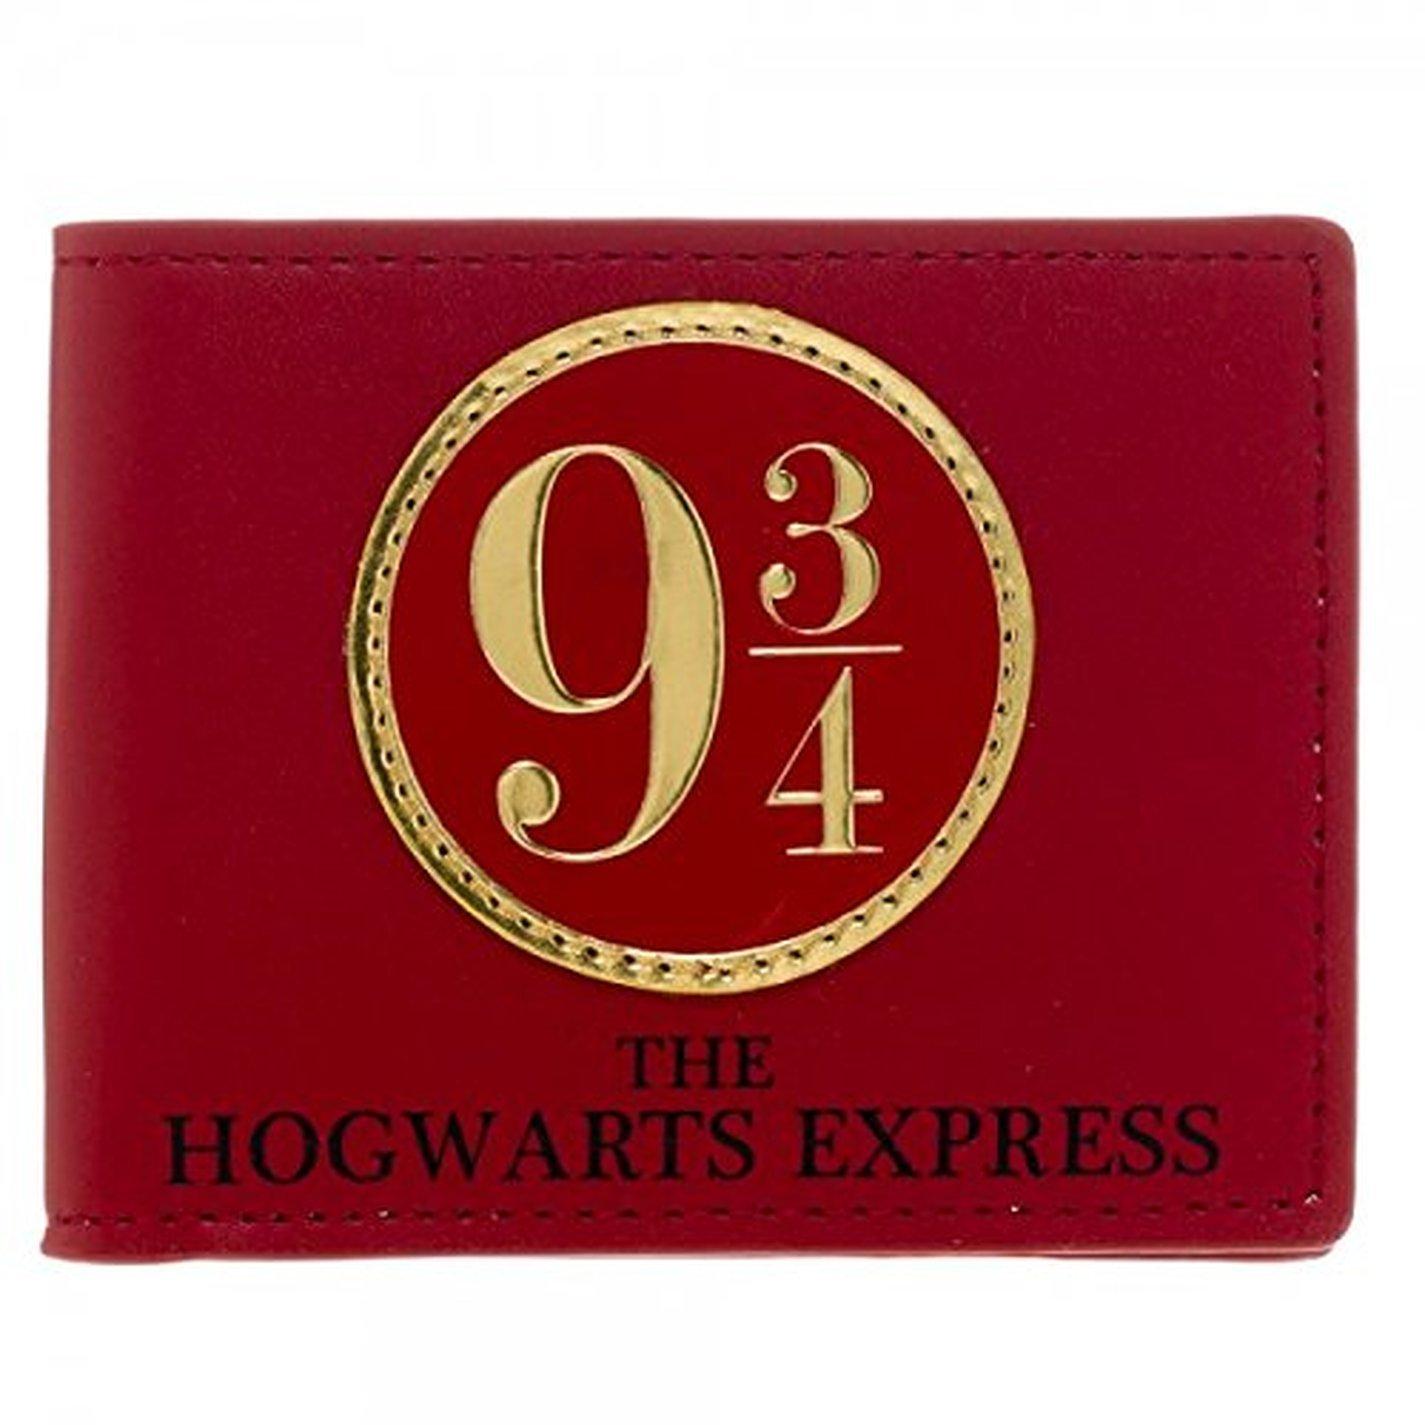 Wallet - Harry Potter - 9 3/4 Bi-Fold New Licensed Gifts mw1sichpt Bioworld MW1SICHPT00PP00